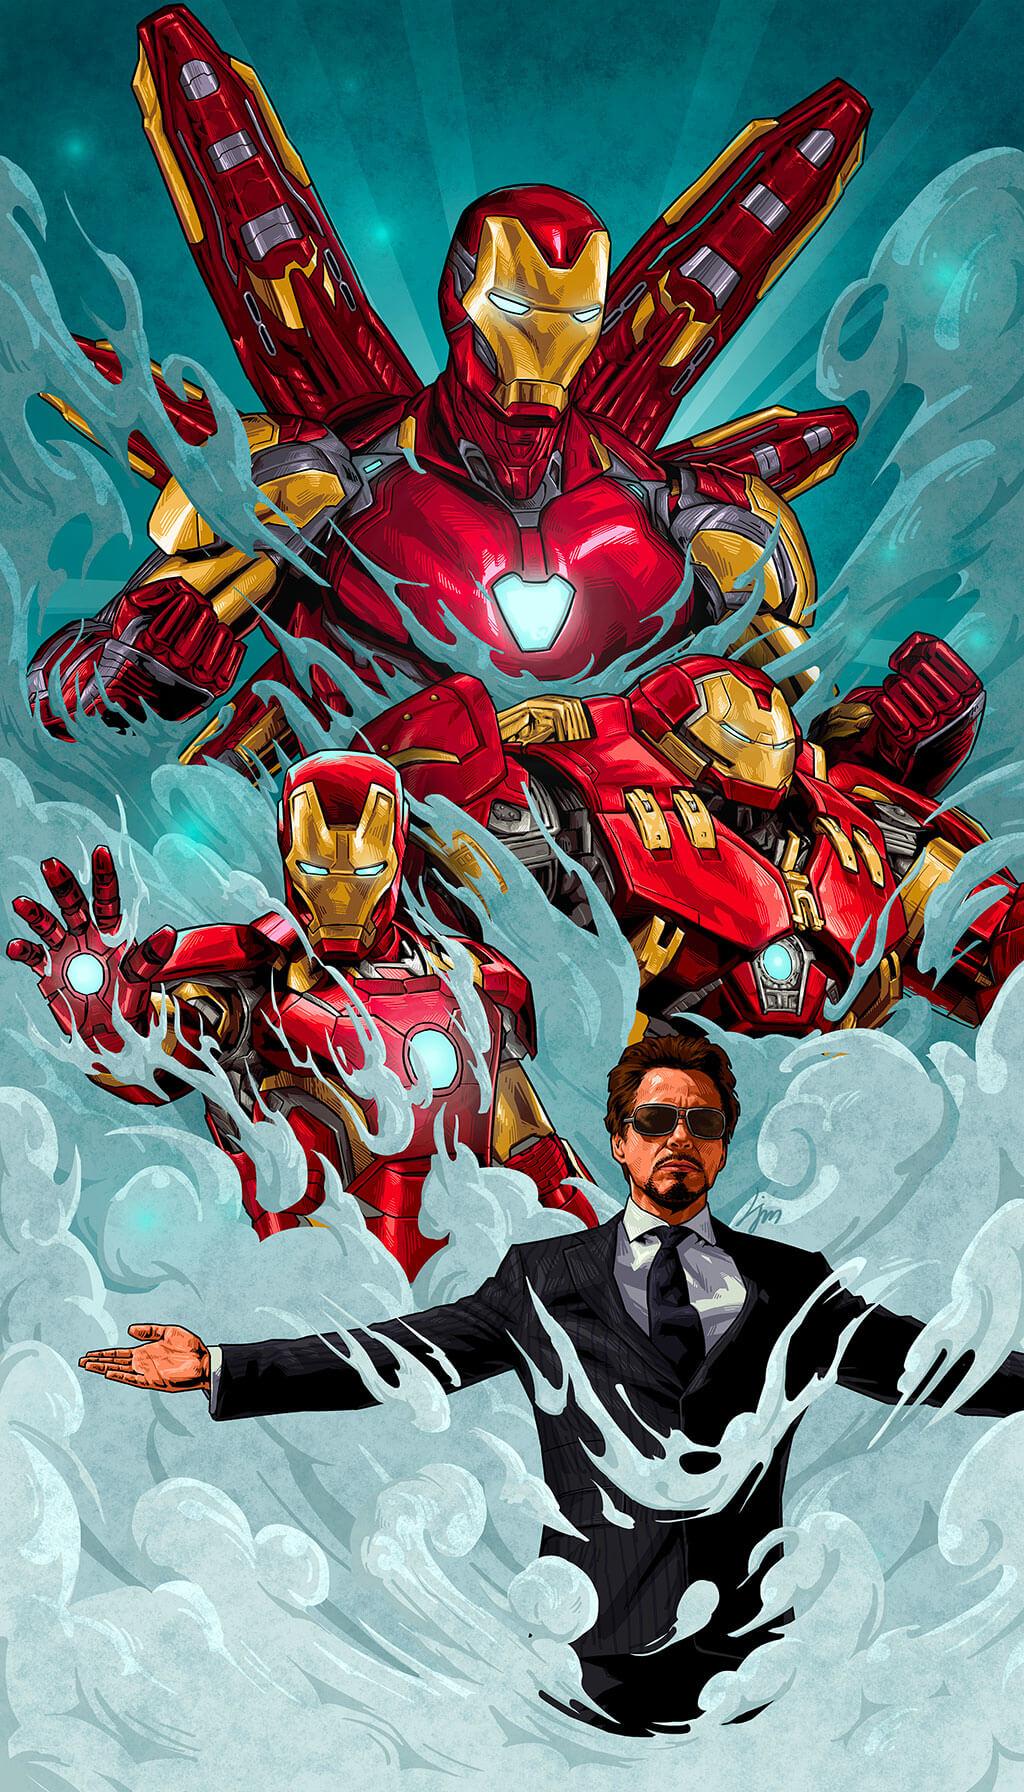 Avengers Fan Art by linjingming jingming